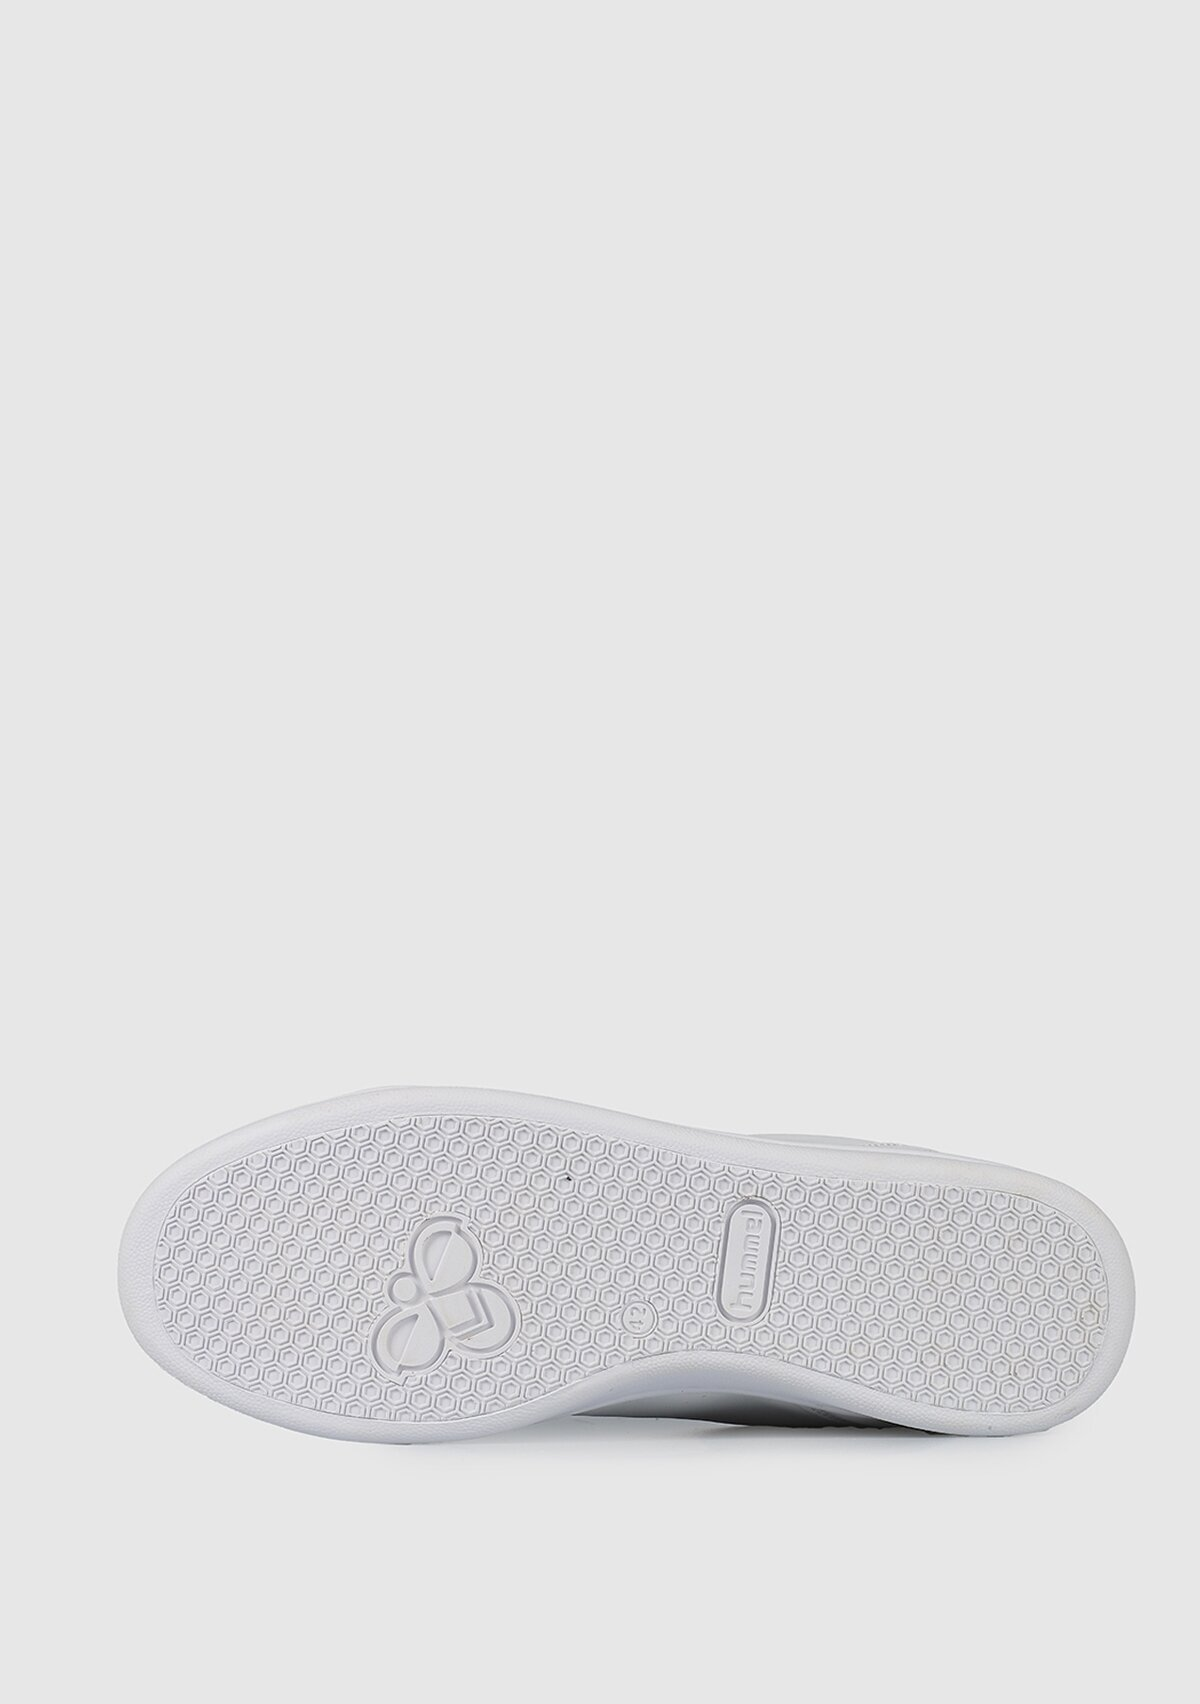 resm Hml Busan Beyaz Unisex Sneaker 208682-2001